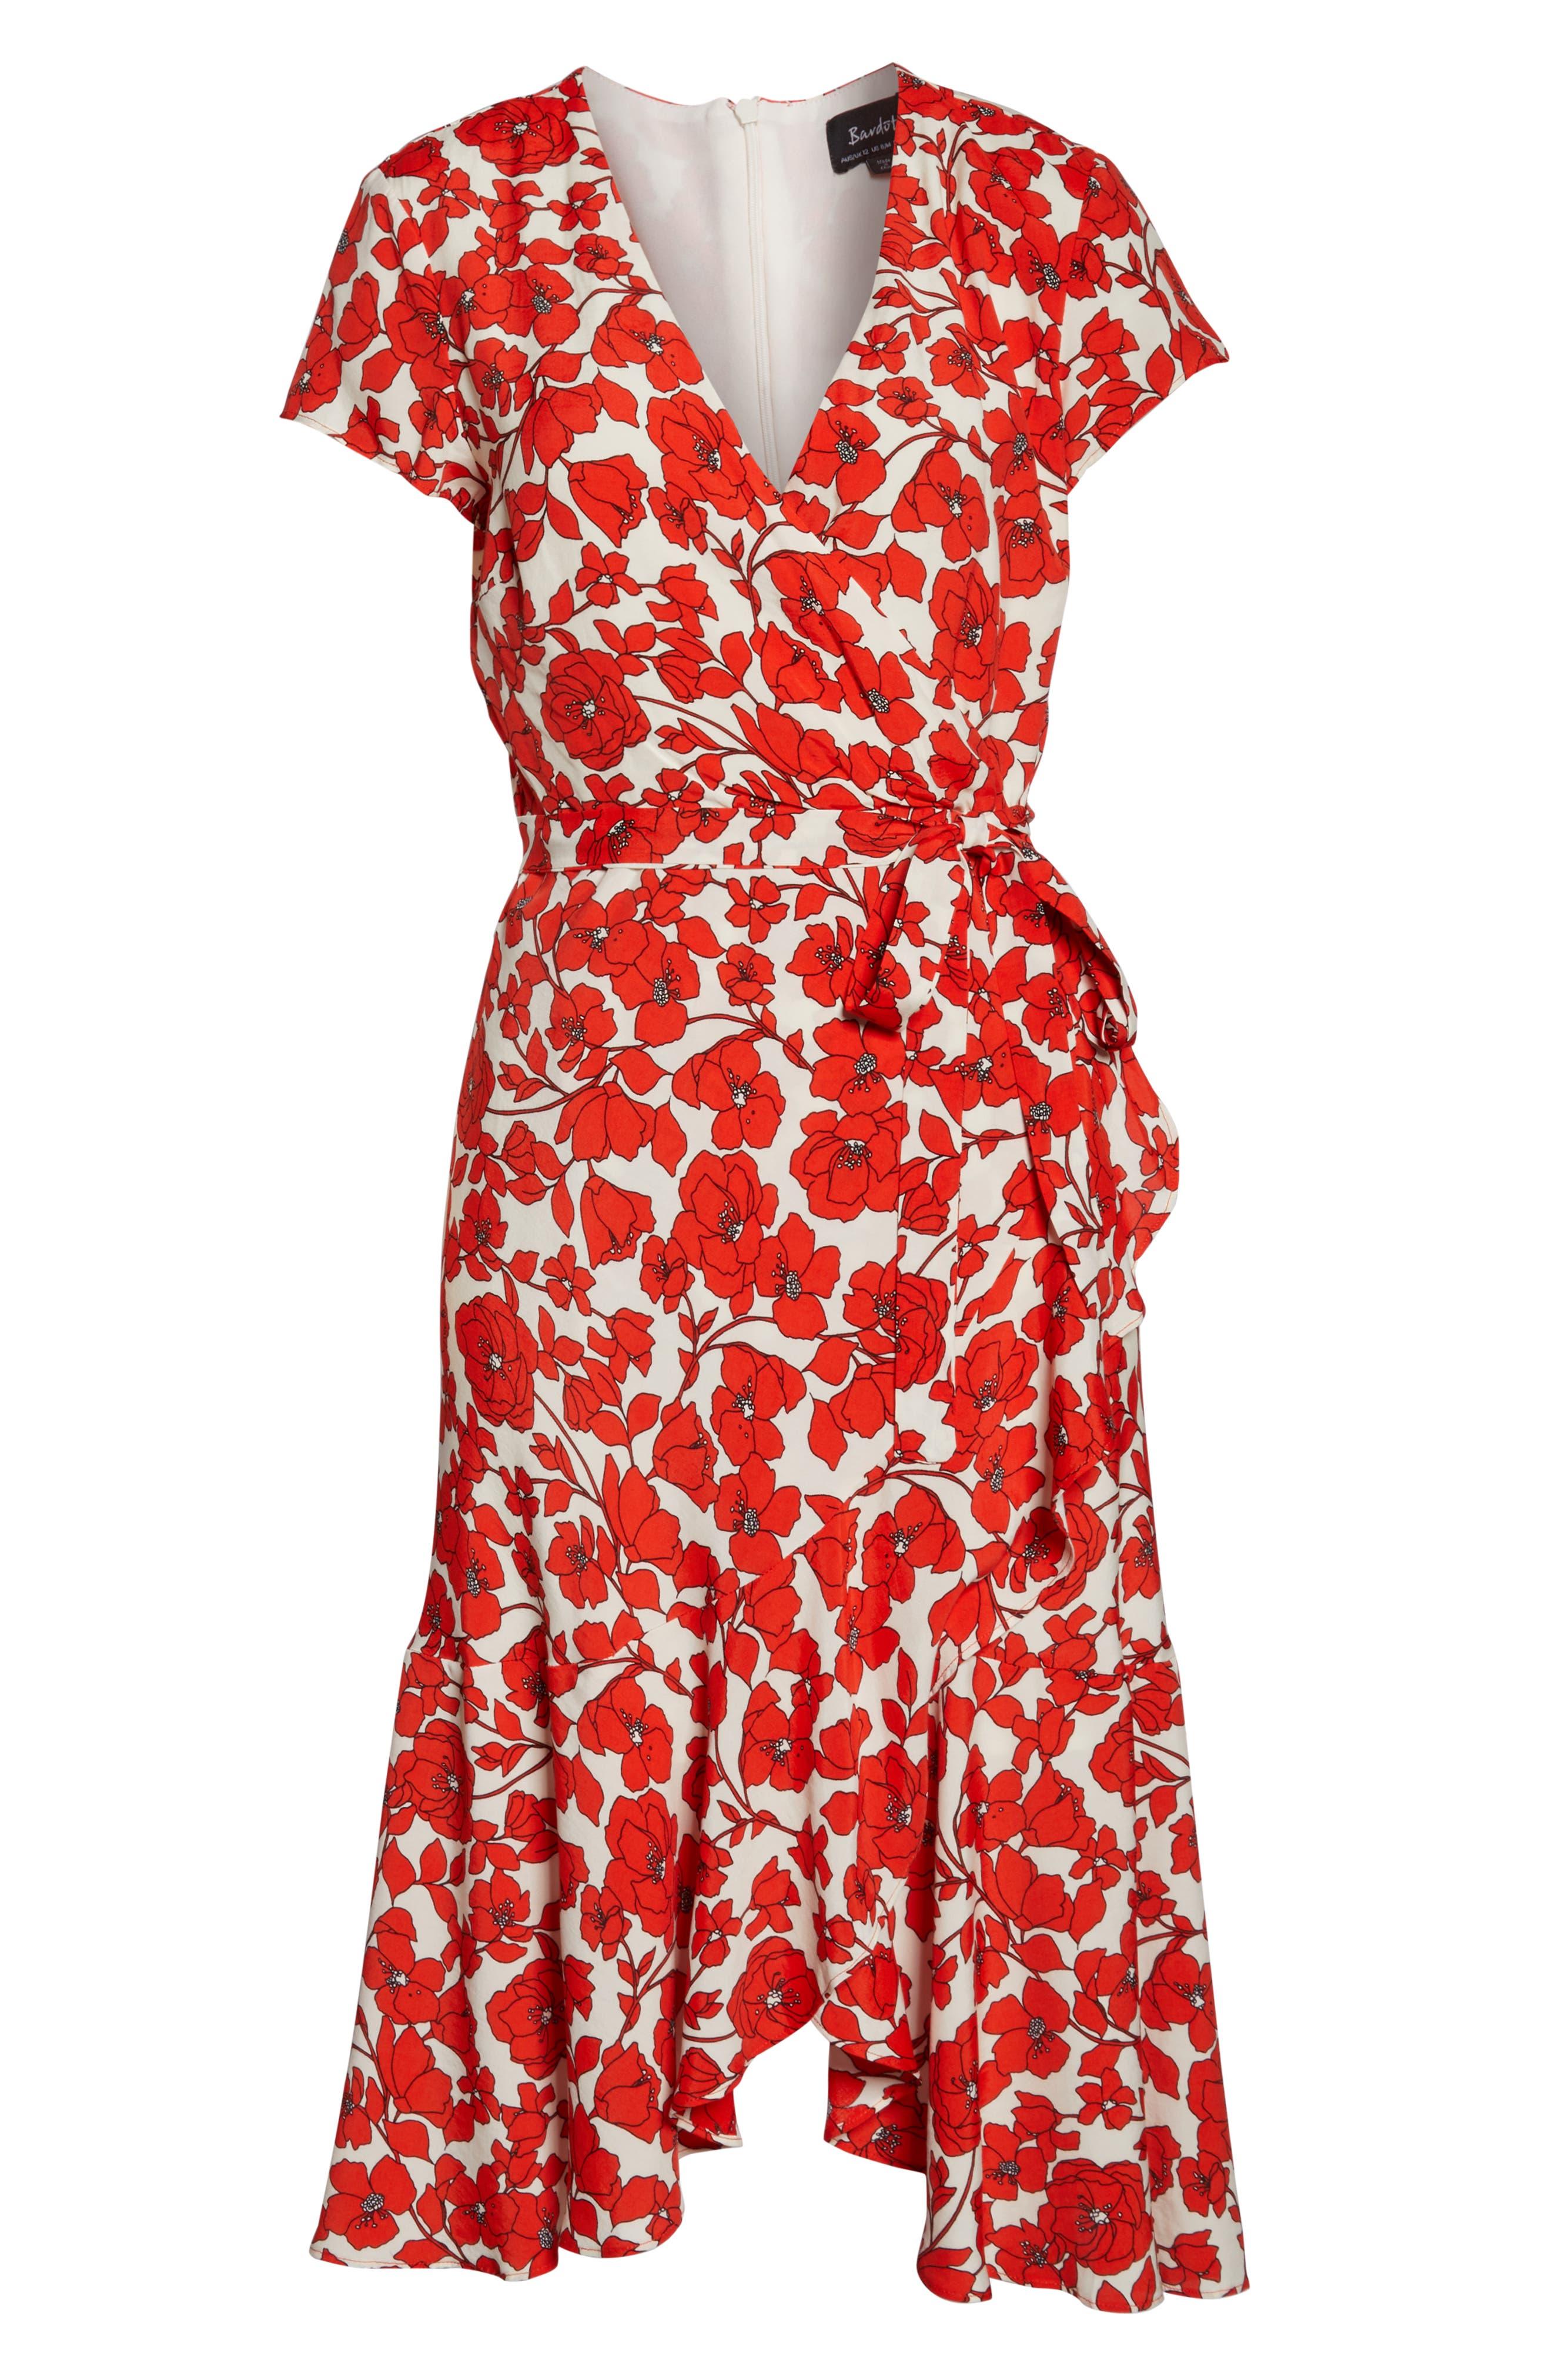 BARDOT, Fiesta Floral Midi Dress, Alternate thumbnail 6, color, 800